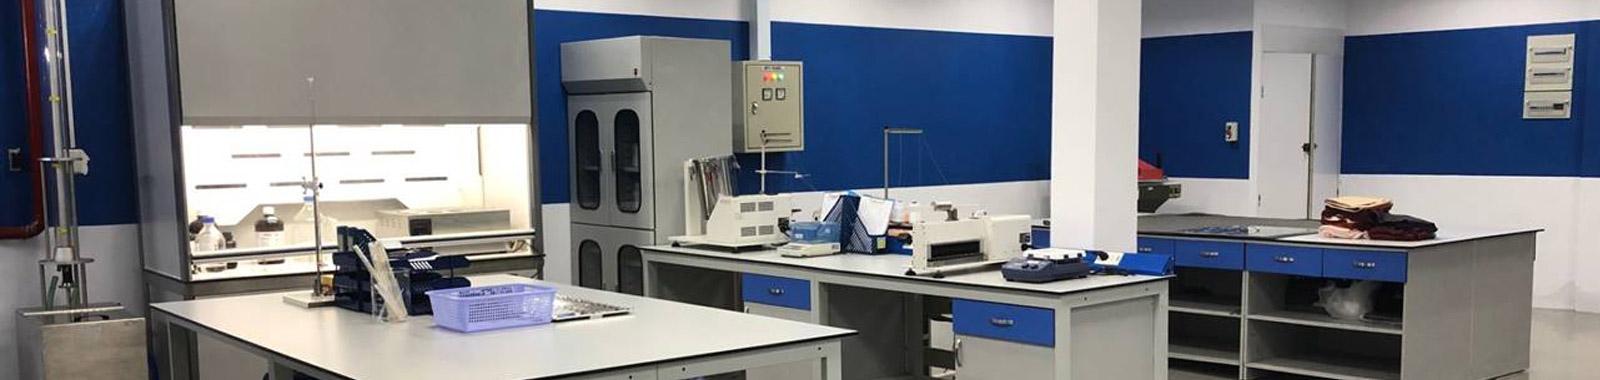 Ho chi Minh - Vietnam Laboratory